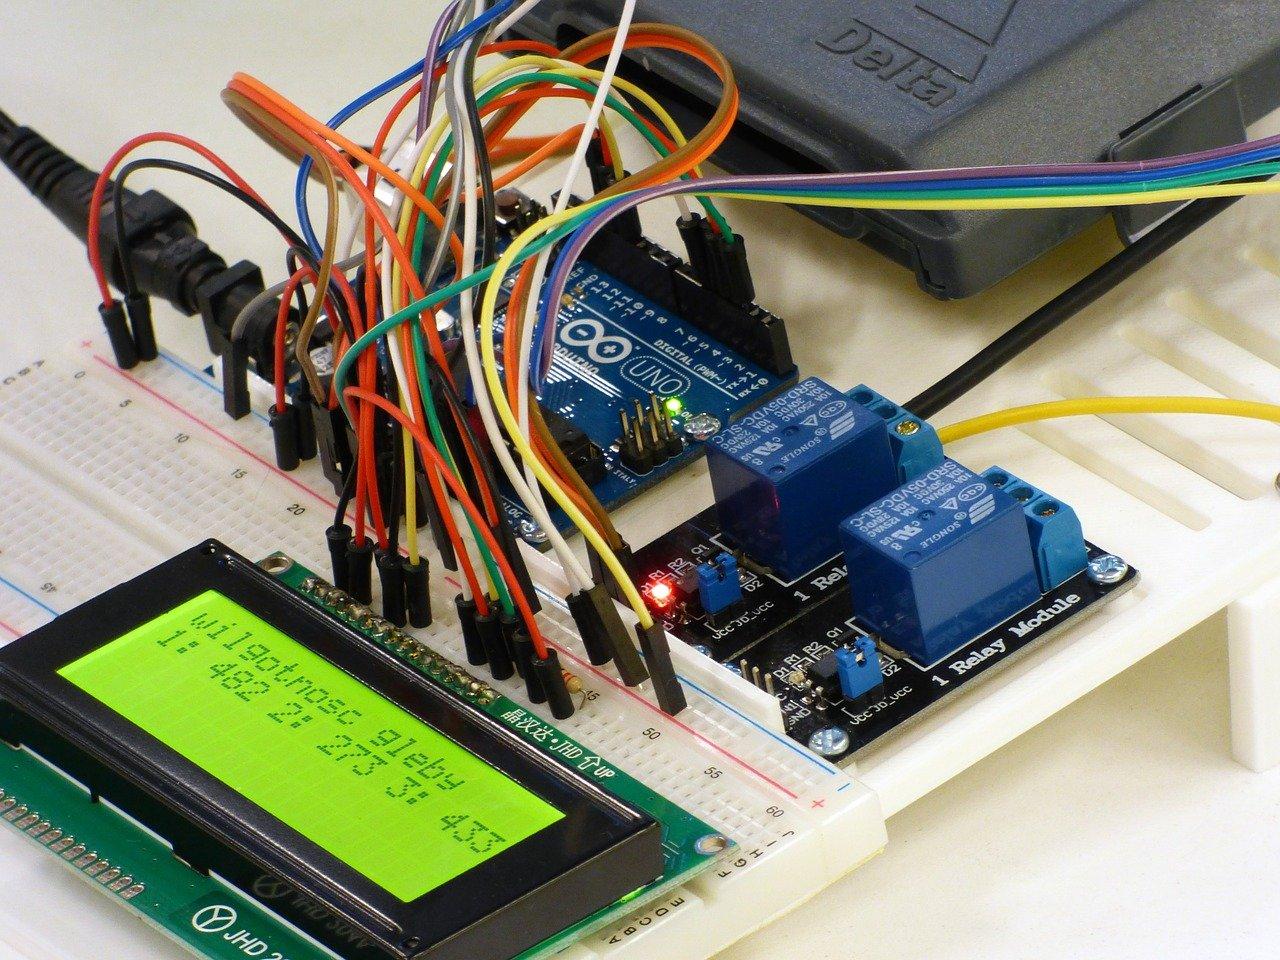 snackenglish, snack, programming, electronics, arduino, board